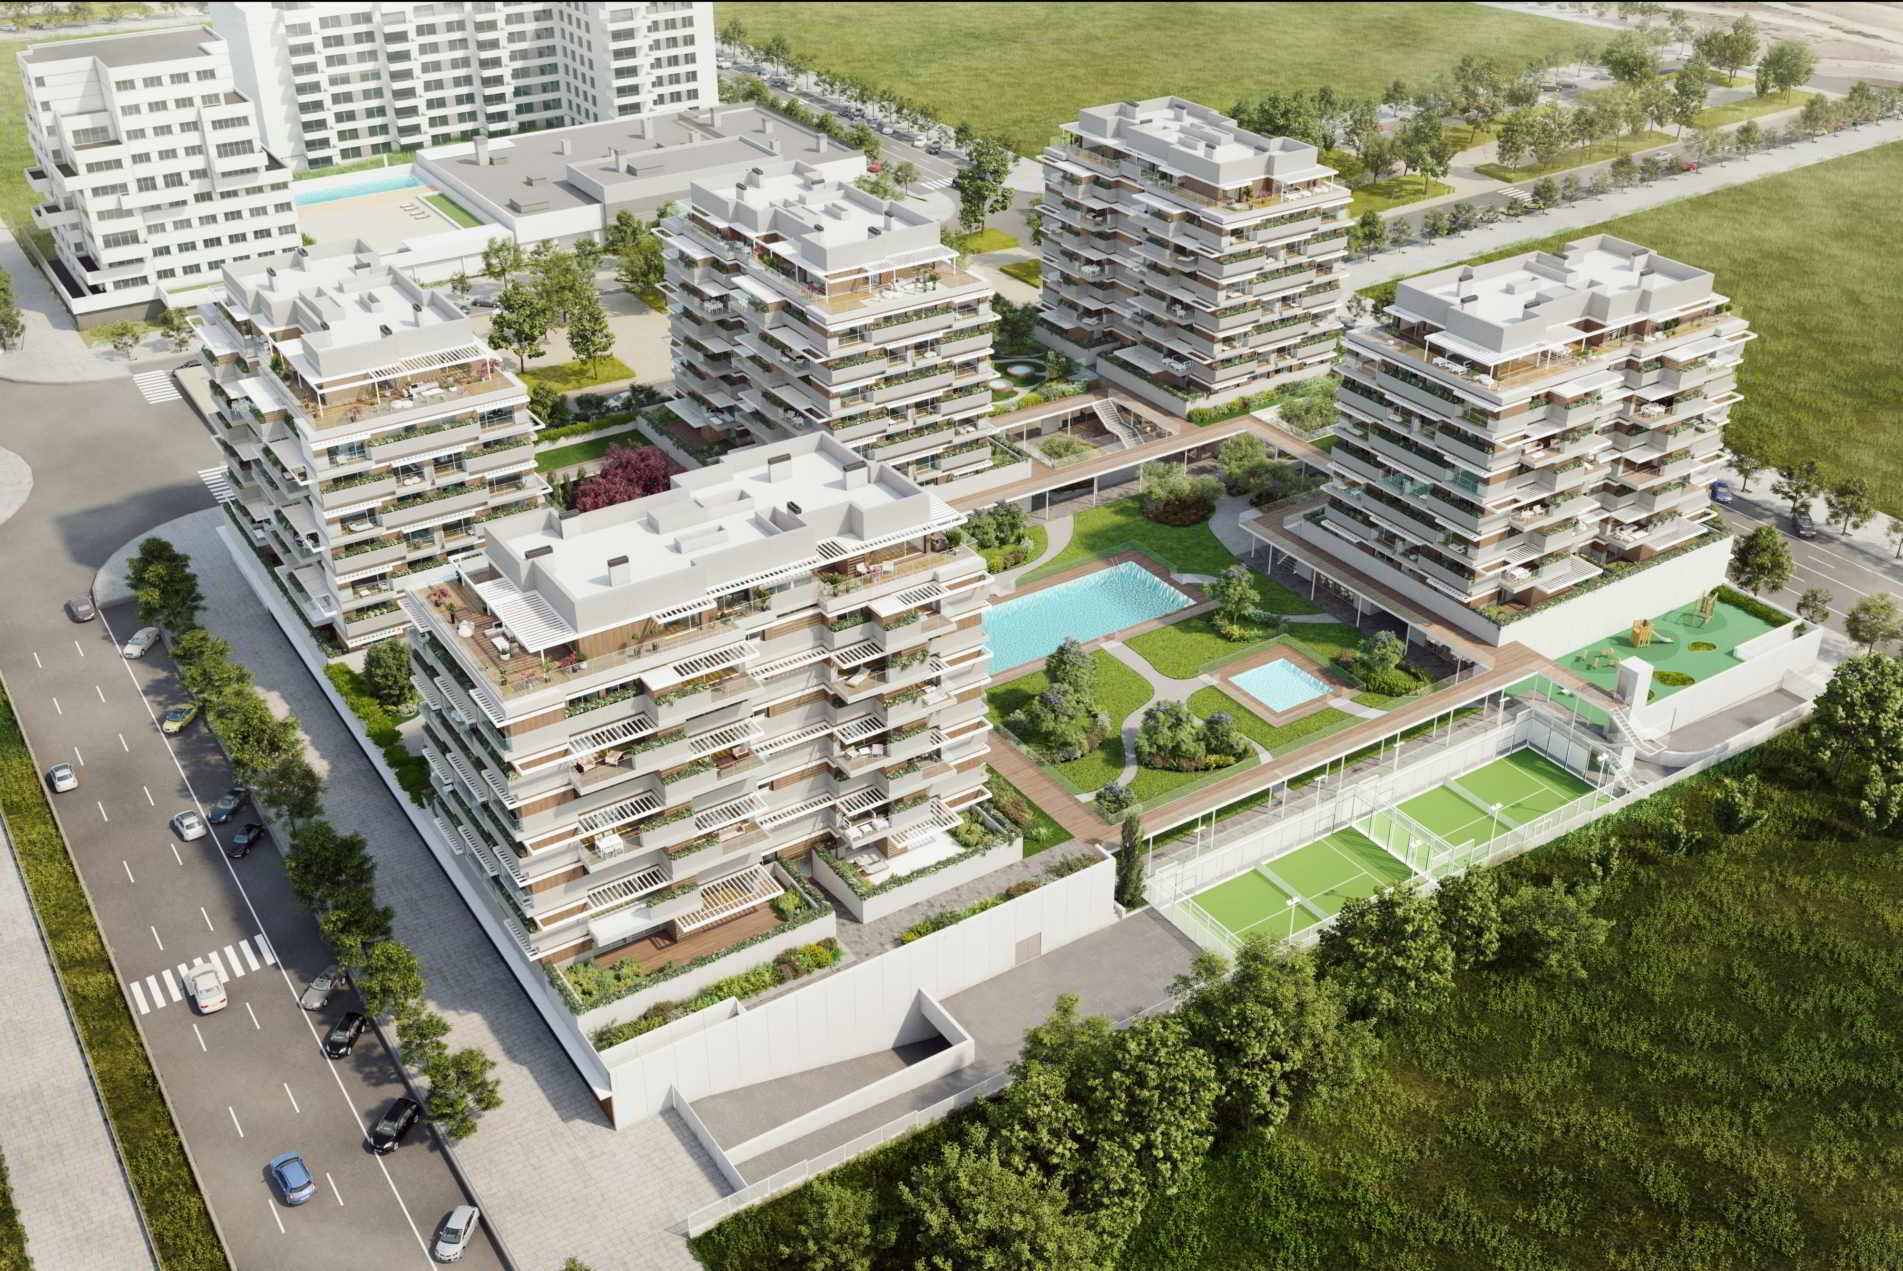 viviendas obra nueva valdebebas noroeste madrid